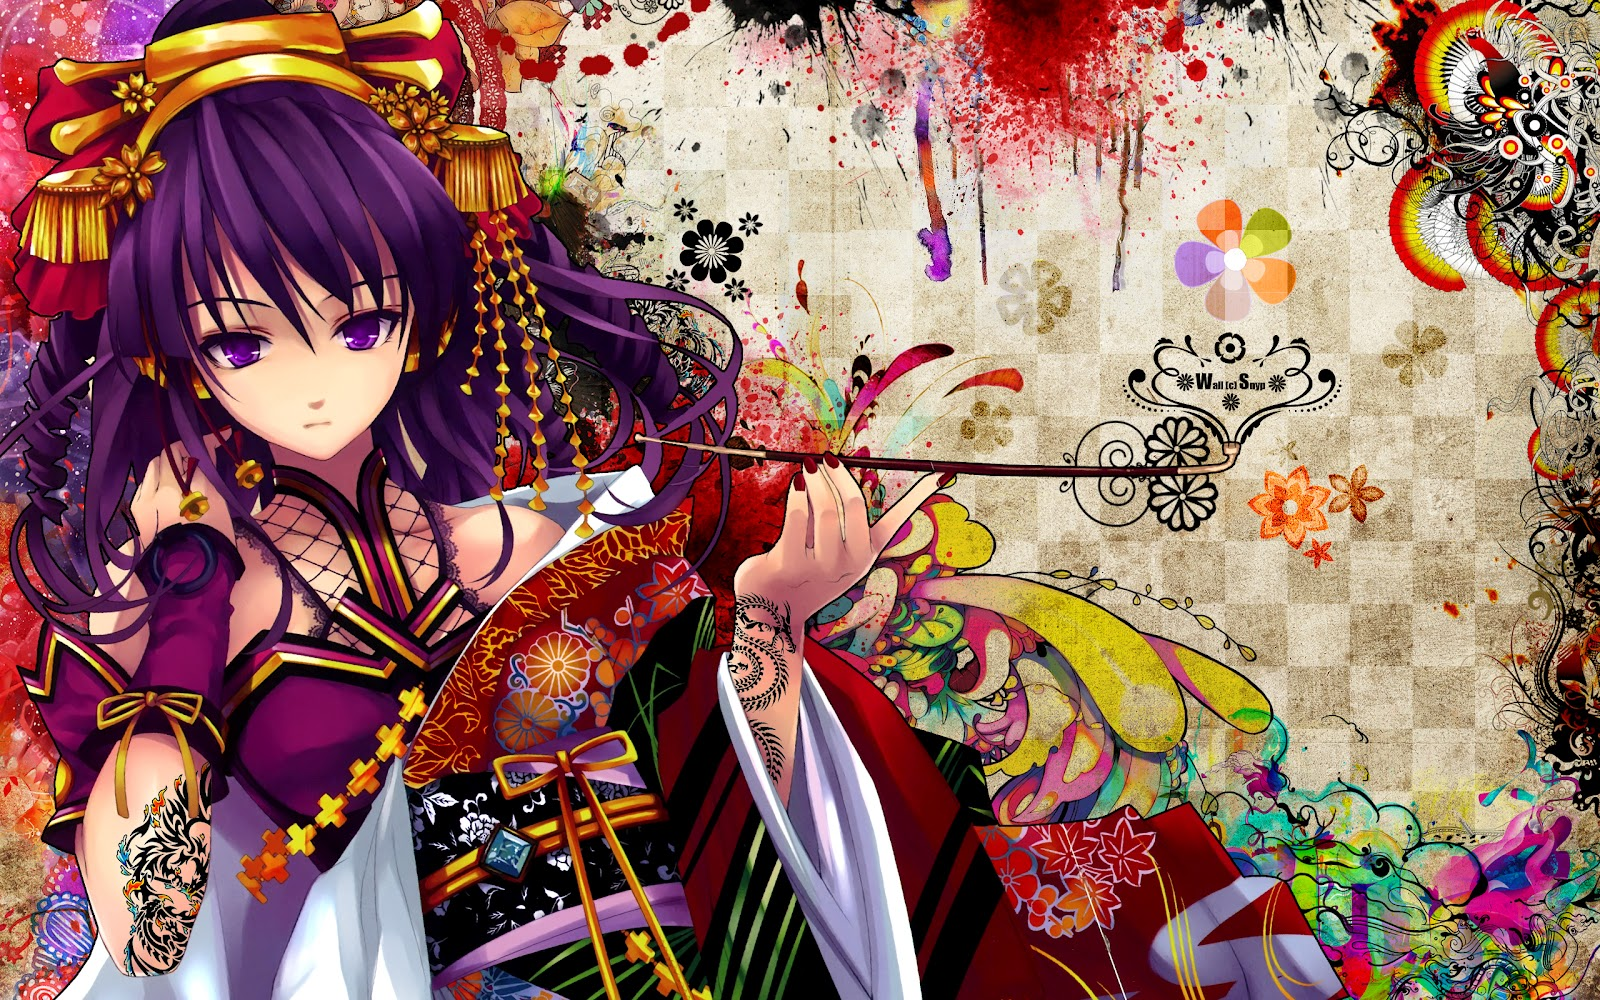 hd wallpapers geisha hd wallpapers geisha hd wallpapers geisha hd 1600x1000